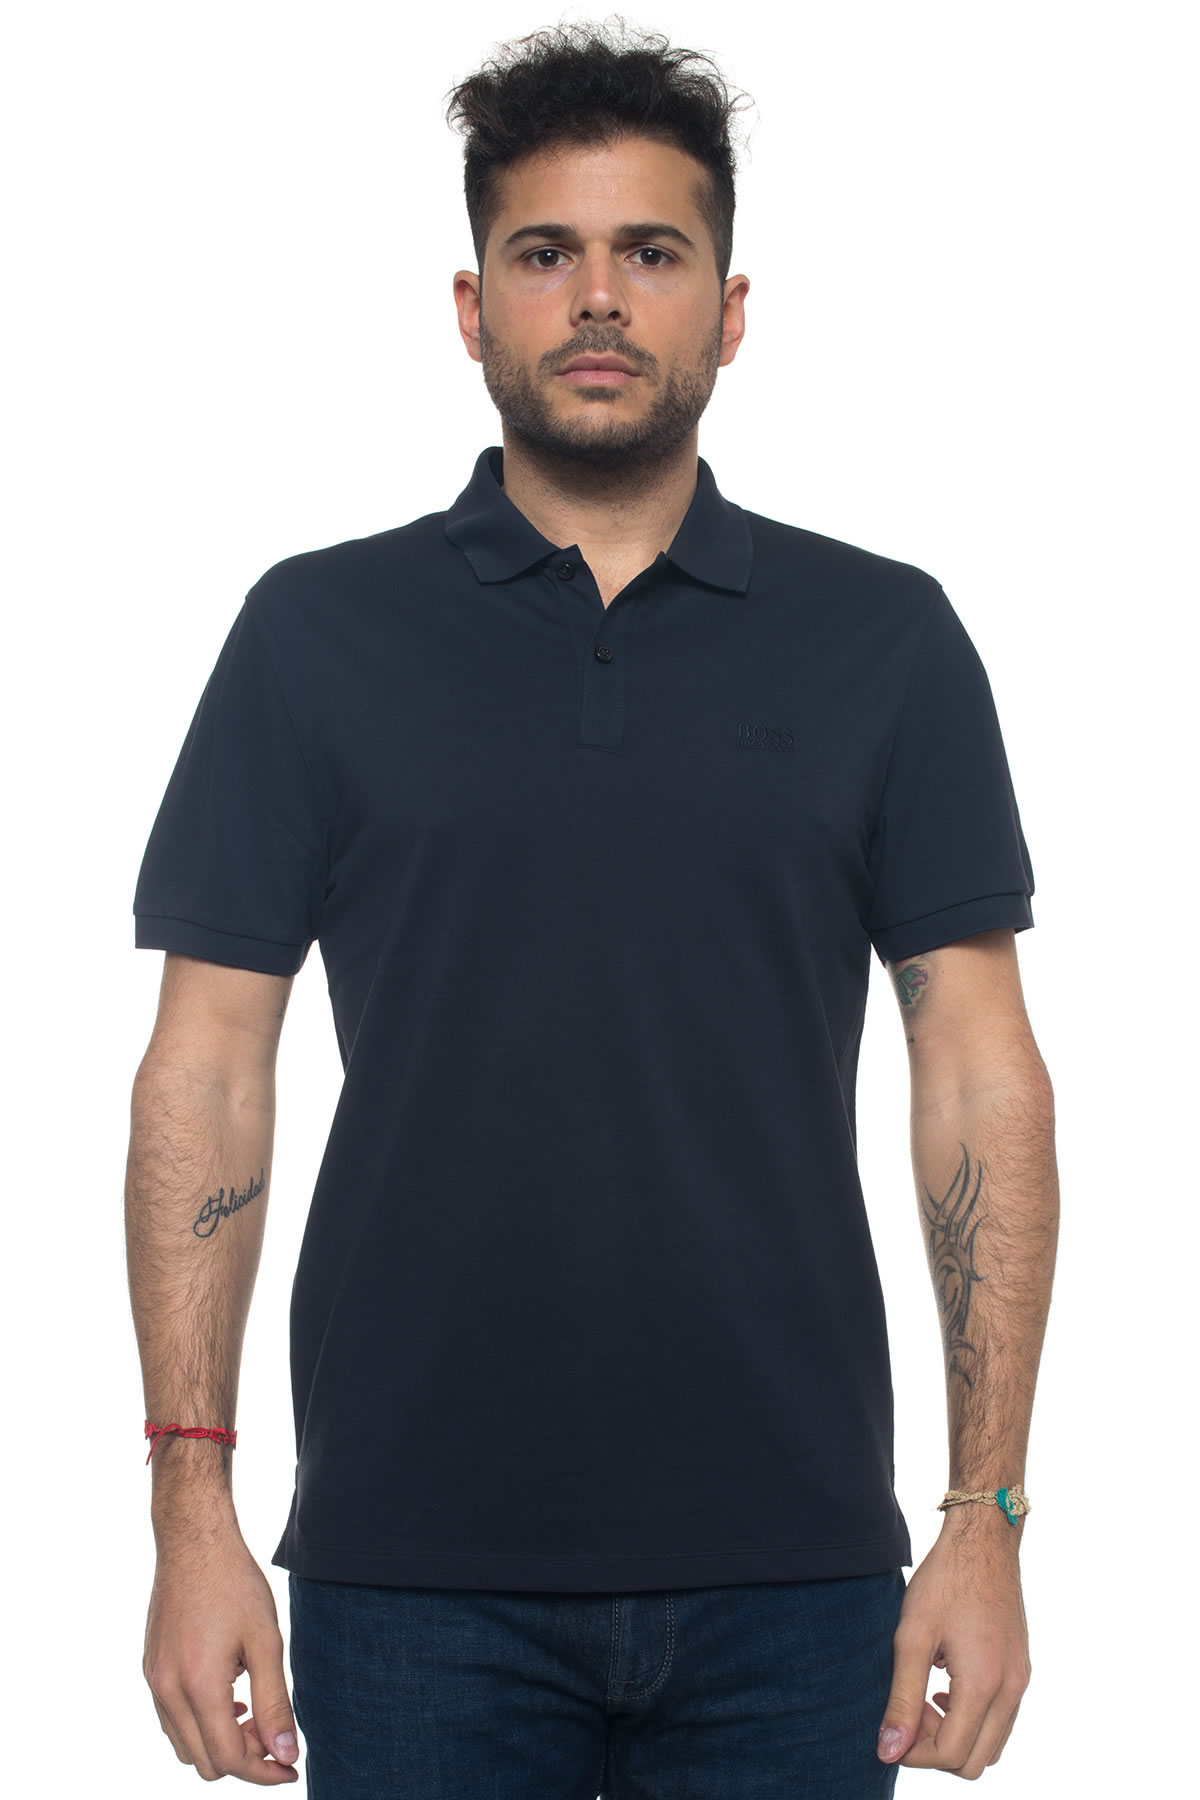 ae648ea8 'Pallas' short sleeve polo shirt - BOSS - ScaglioneIschia